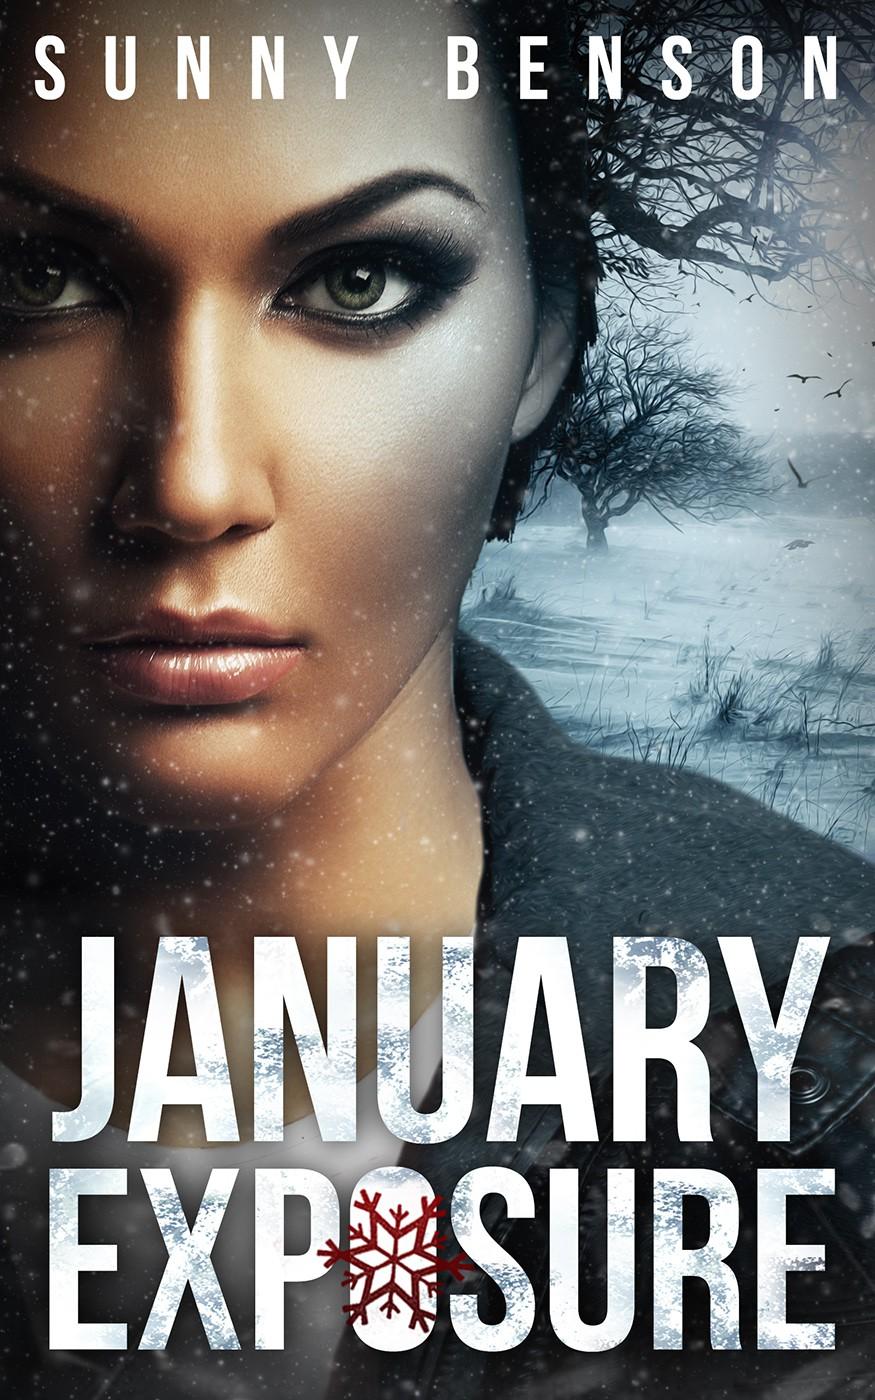 Book Cover for Mystery Novel